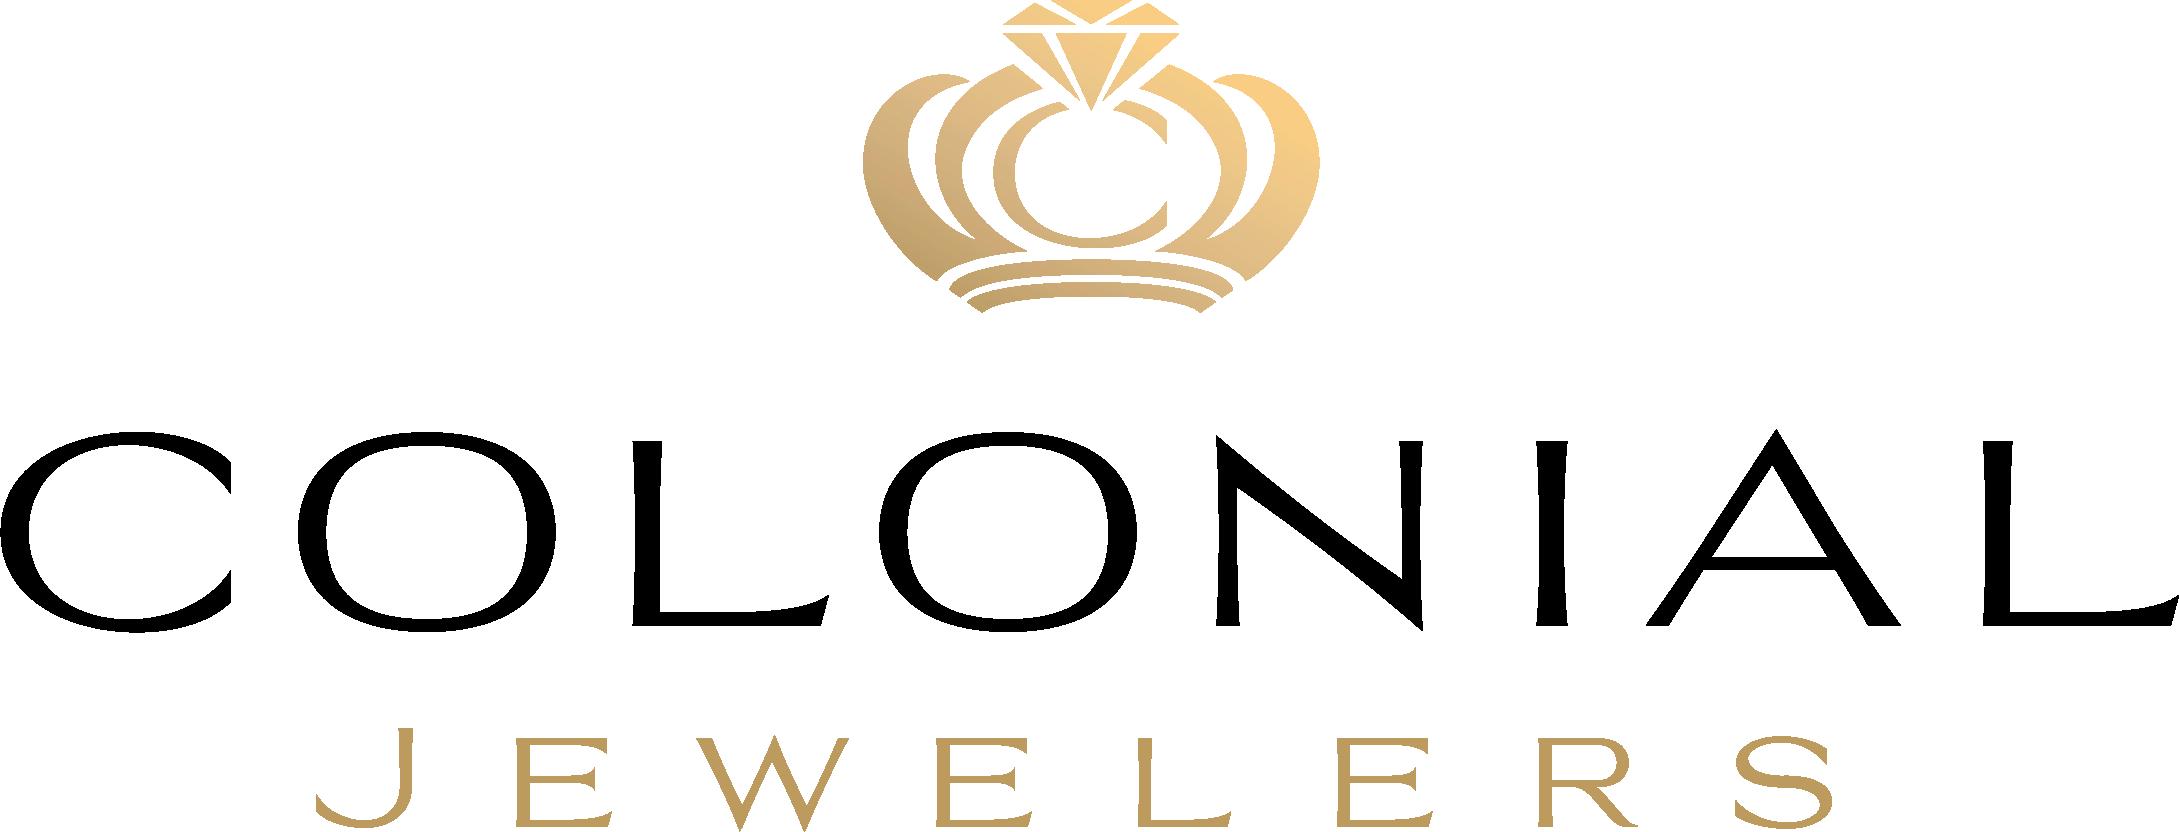 Colonial Jewelers logo